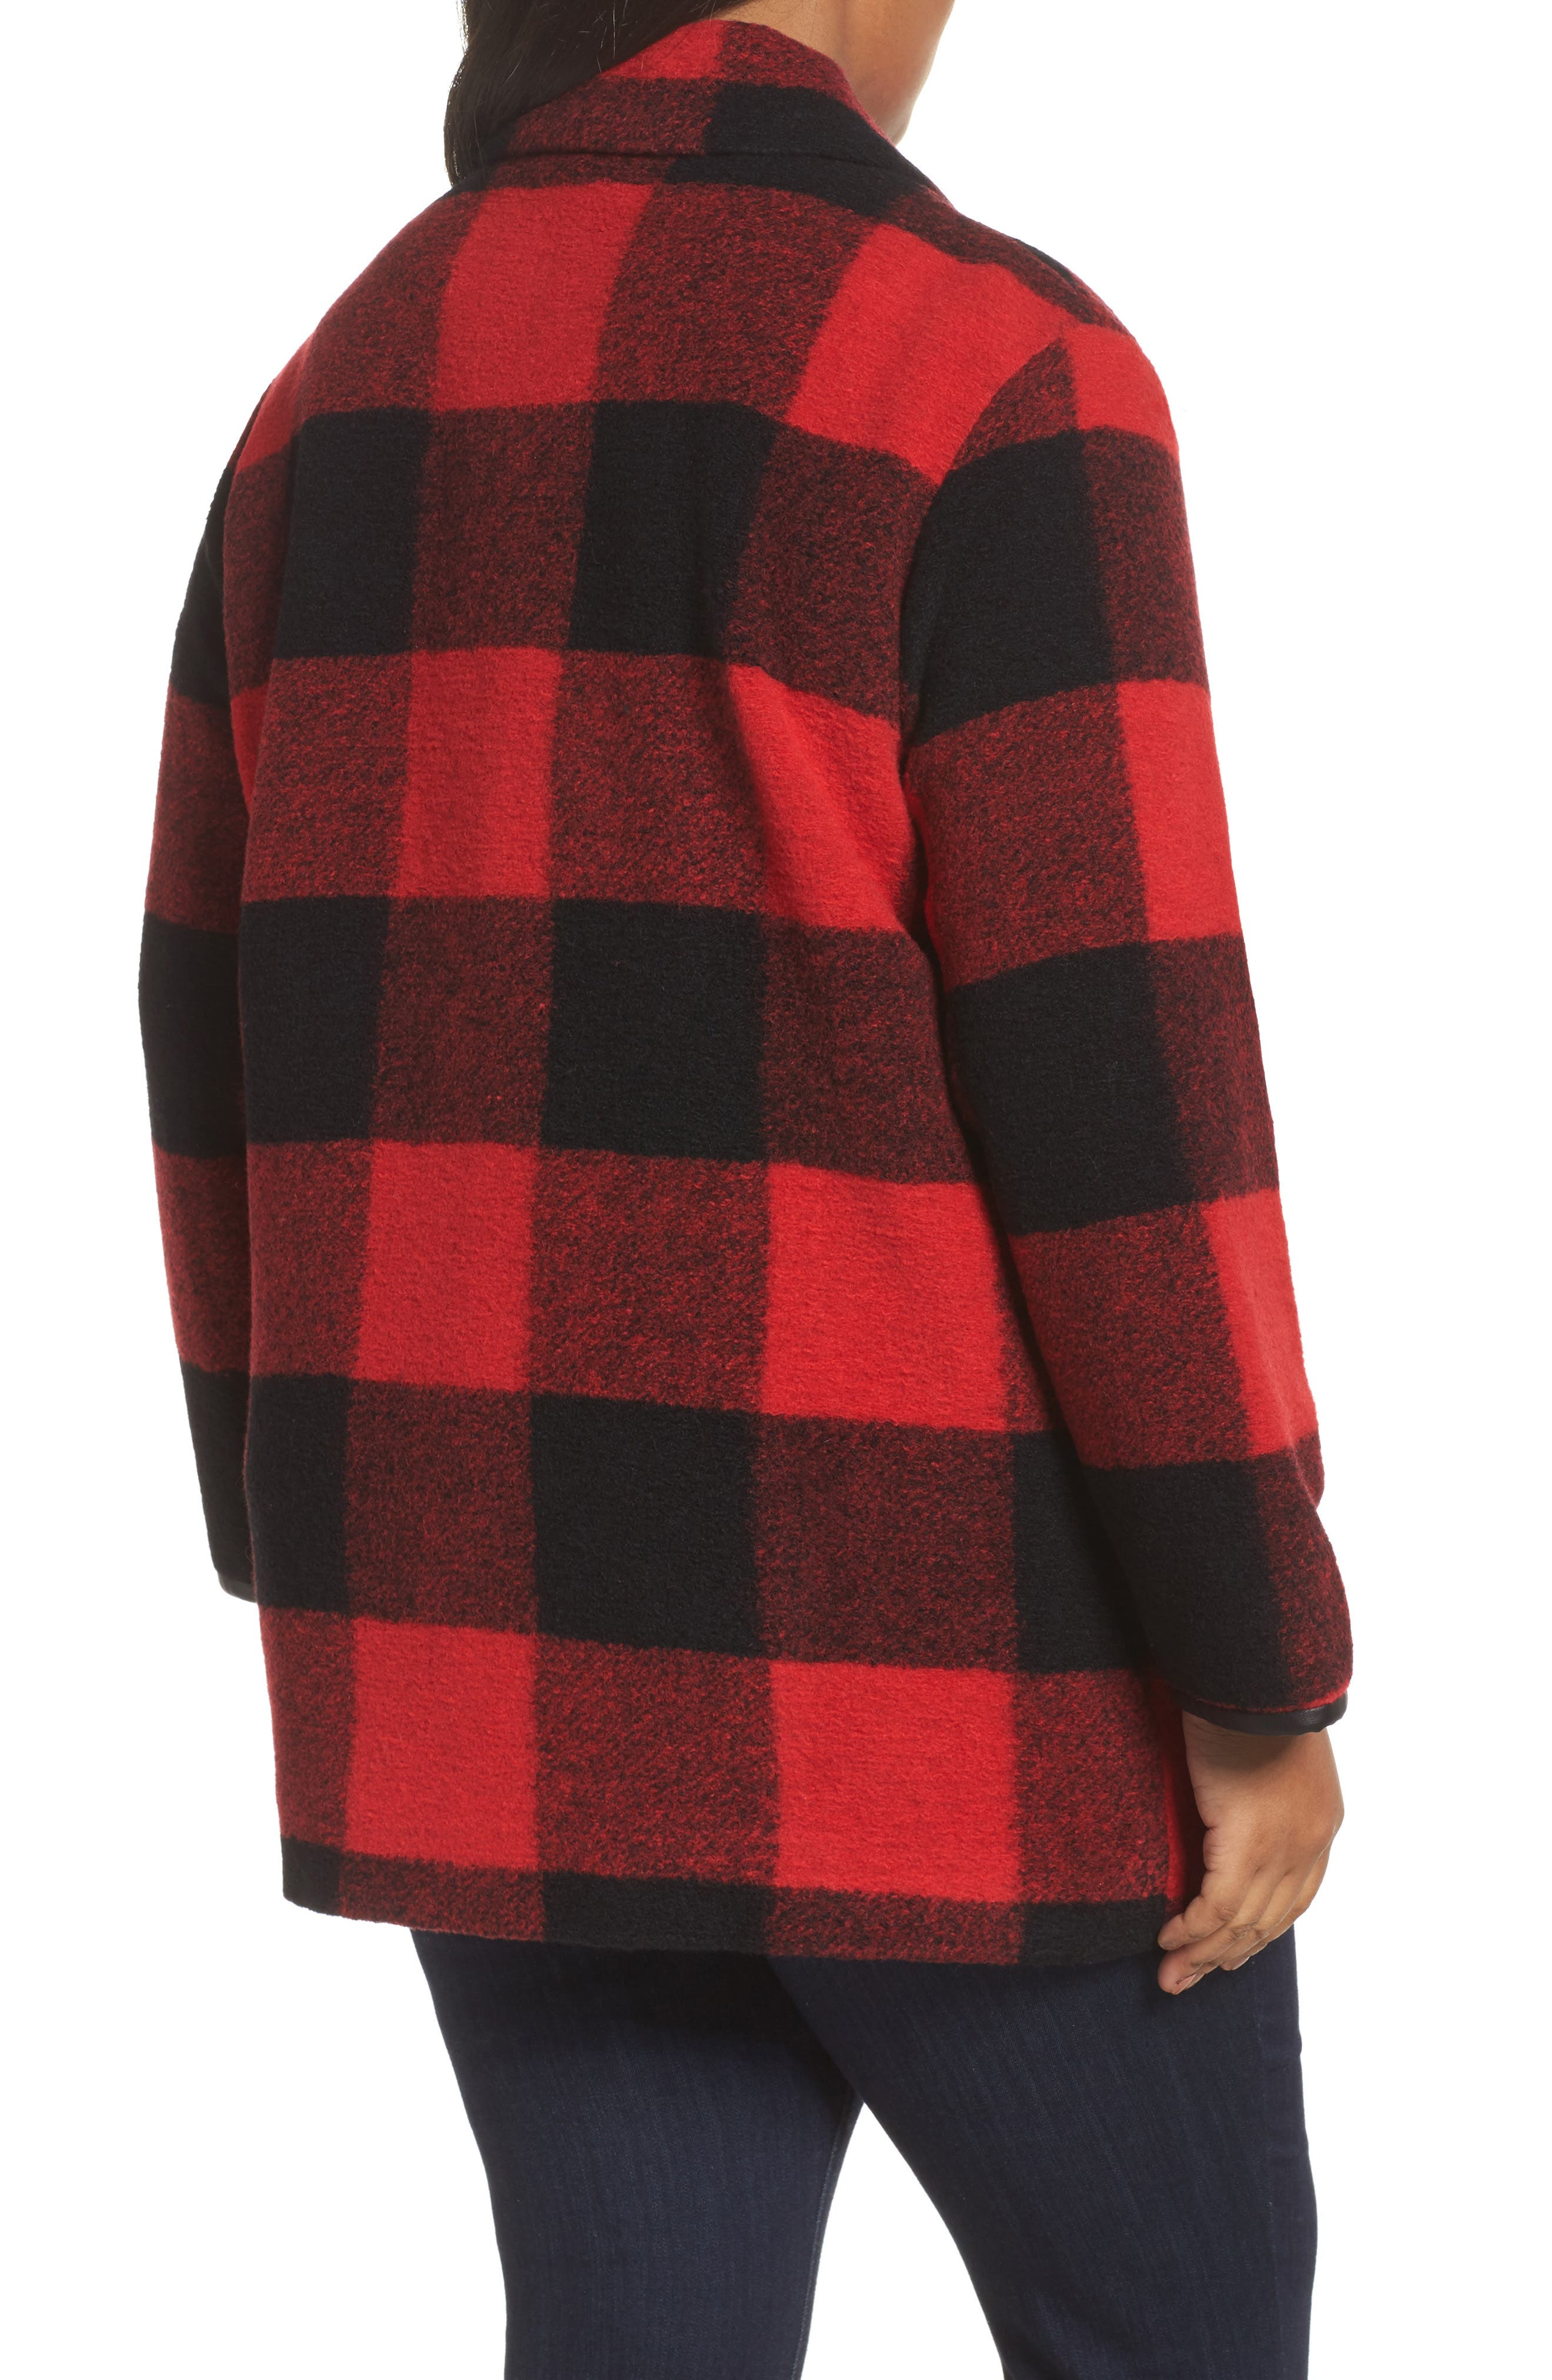 Alternate Image 2  - Pendleton Paul Bunyan Plaid Wool Blend Barn Coat (Plus Size)